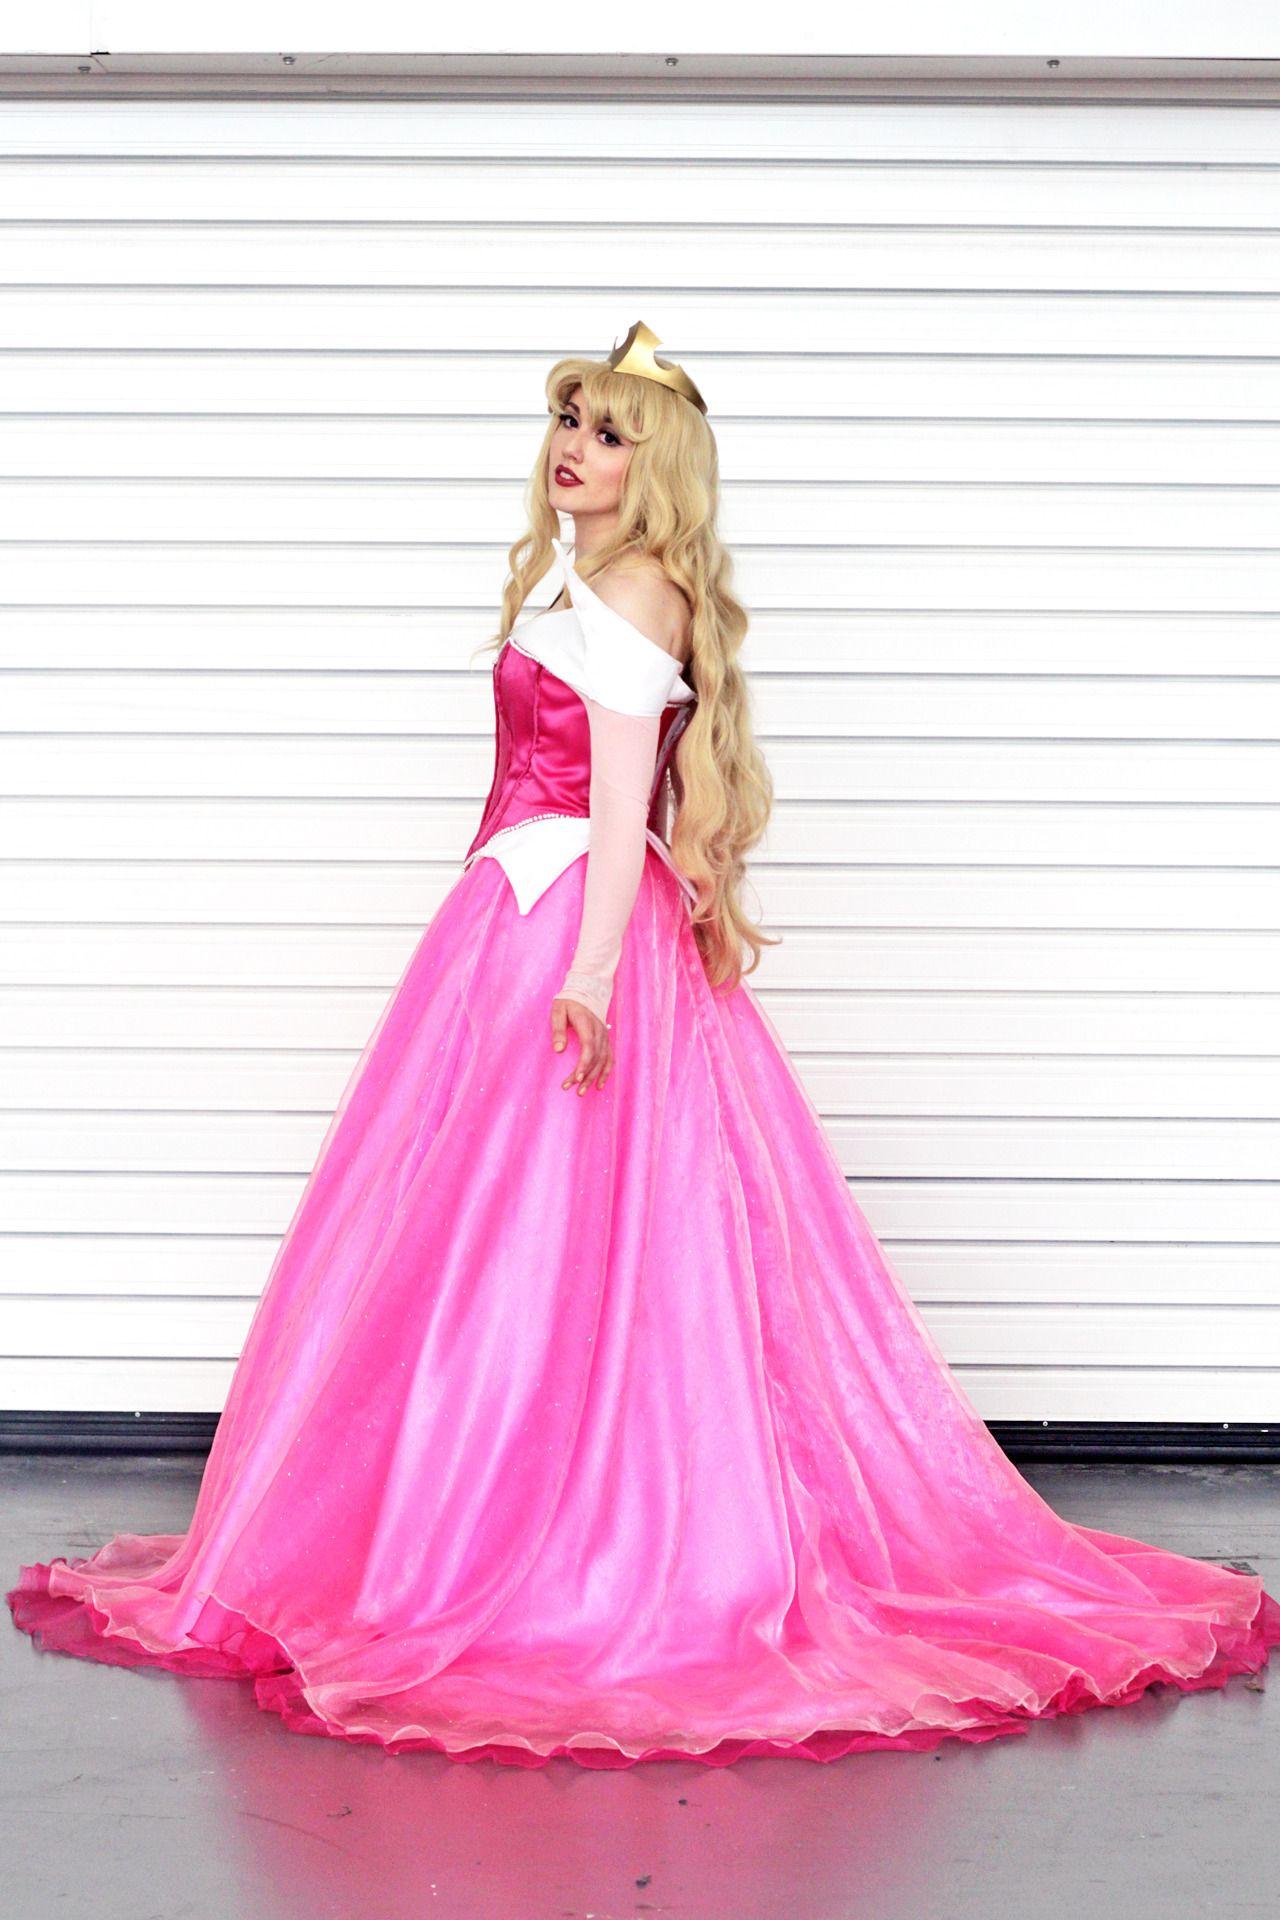 Aurora from disneys sleeping beauty by briar rose cosplay